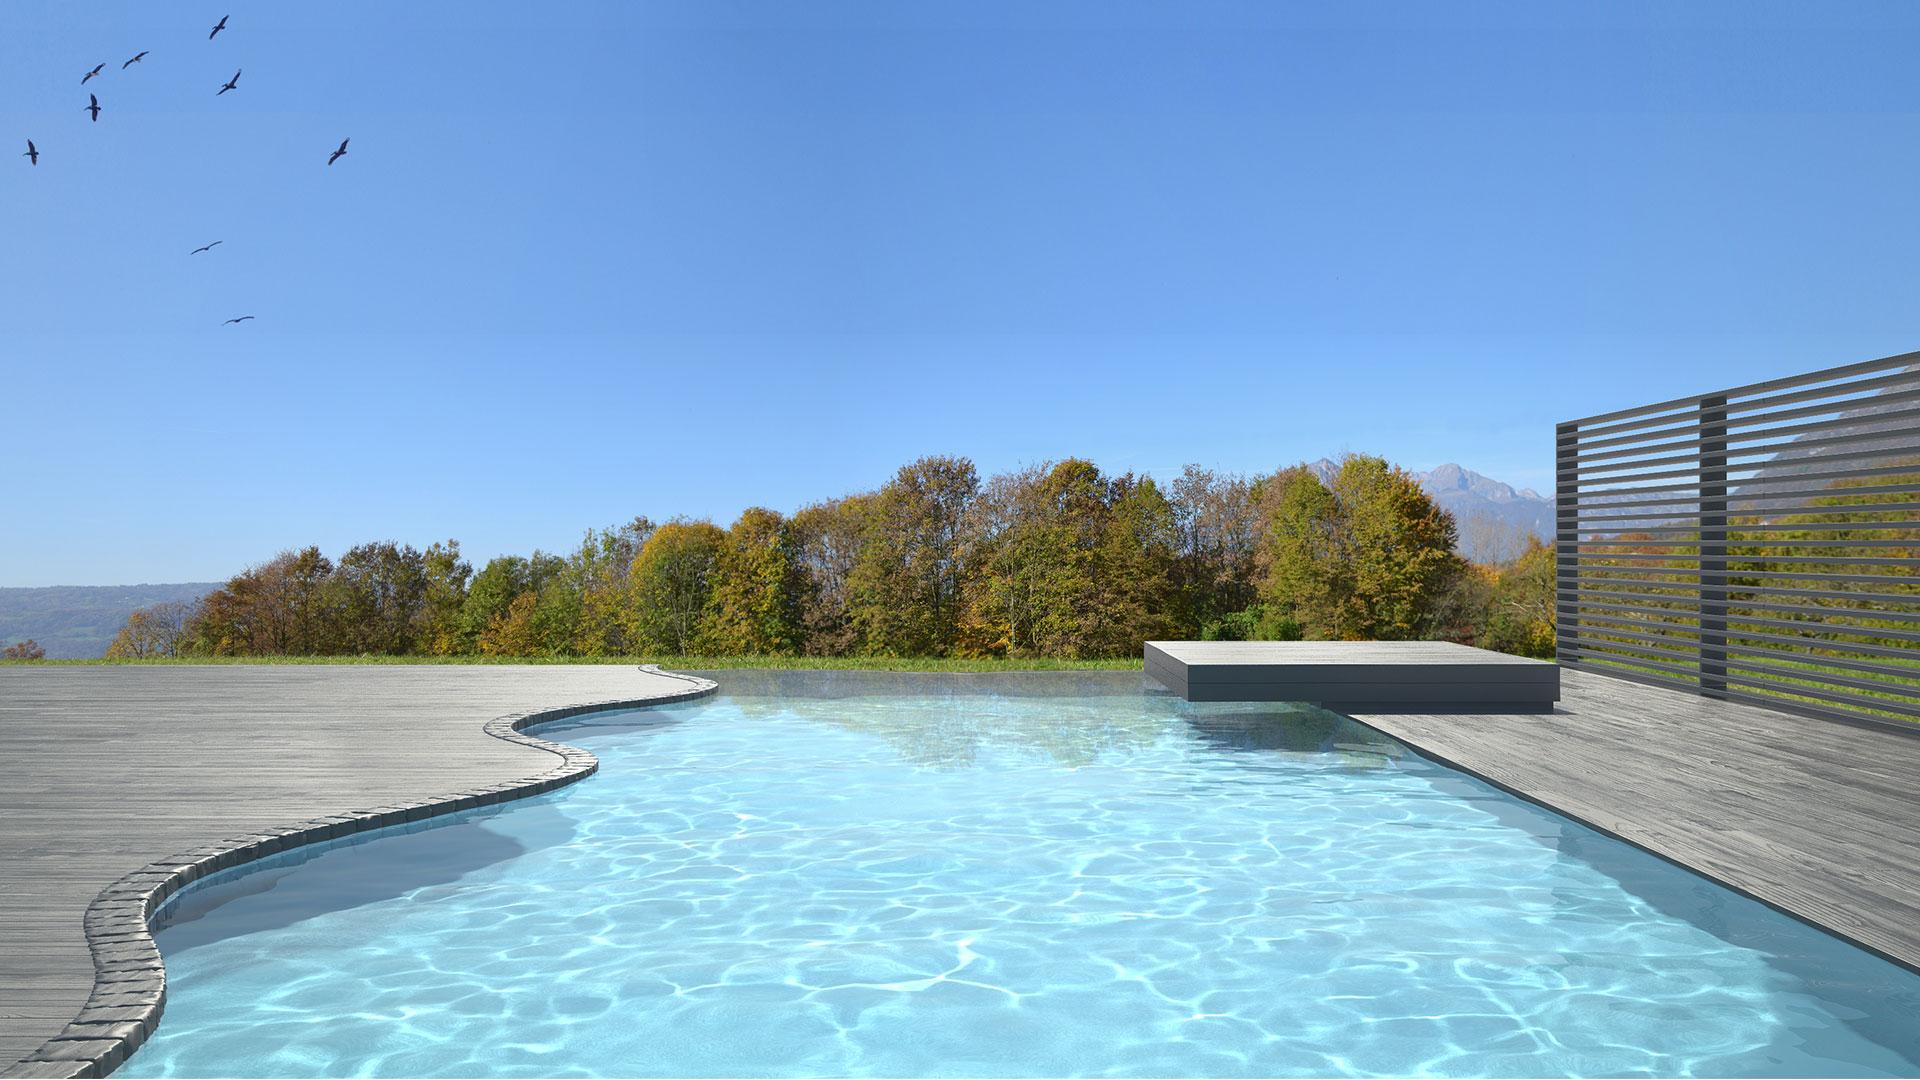 Gallery santa barbara pool building pool remodeling and - Swimming pool contractors ventura county ...